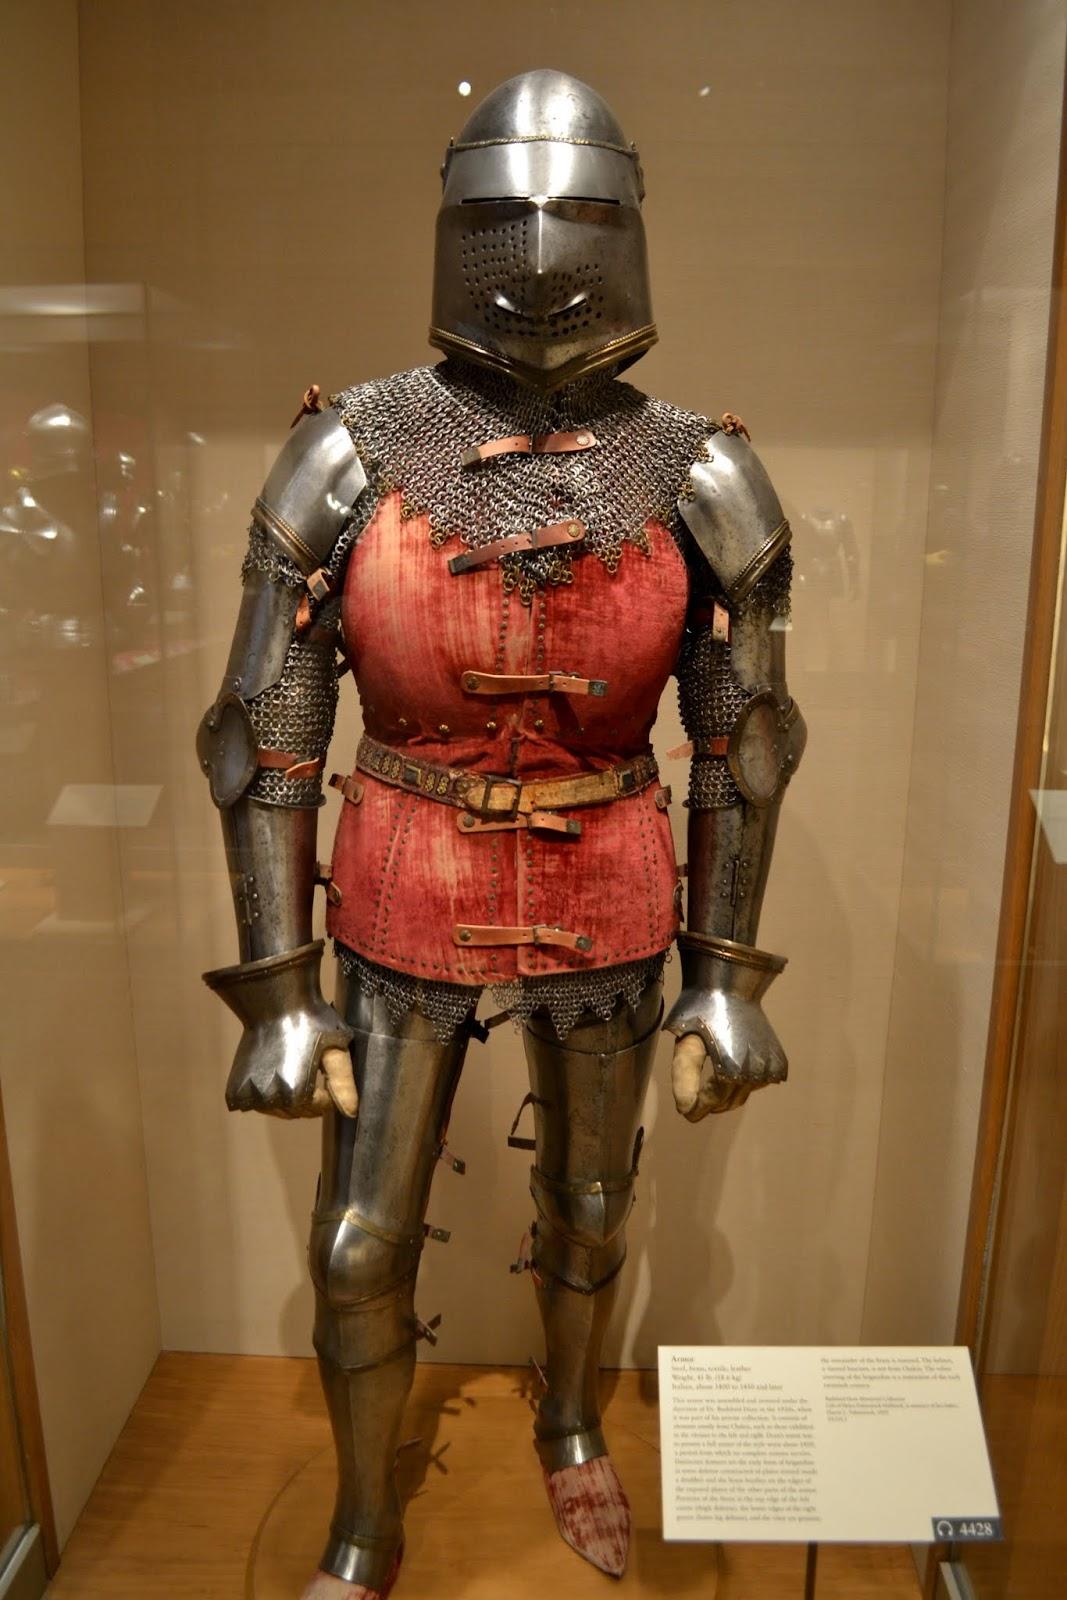 Рыцарские доспехи. Метрополитен-музей. Нью-Йорк, Нью-Йорк (The Metropolitan Museum of Art, NYC)